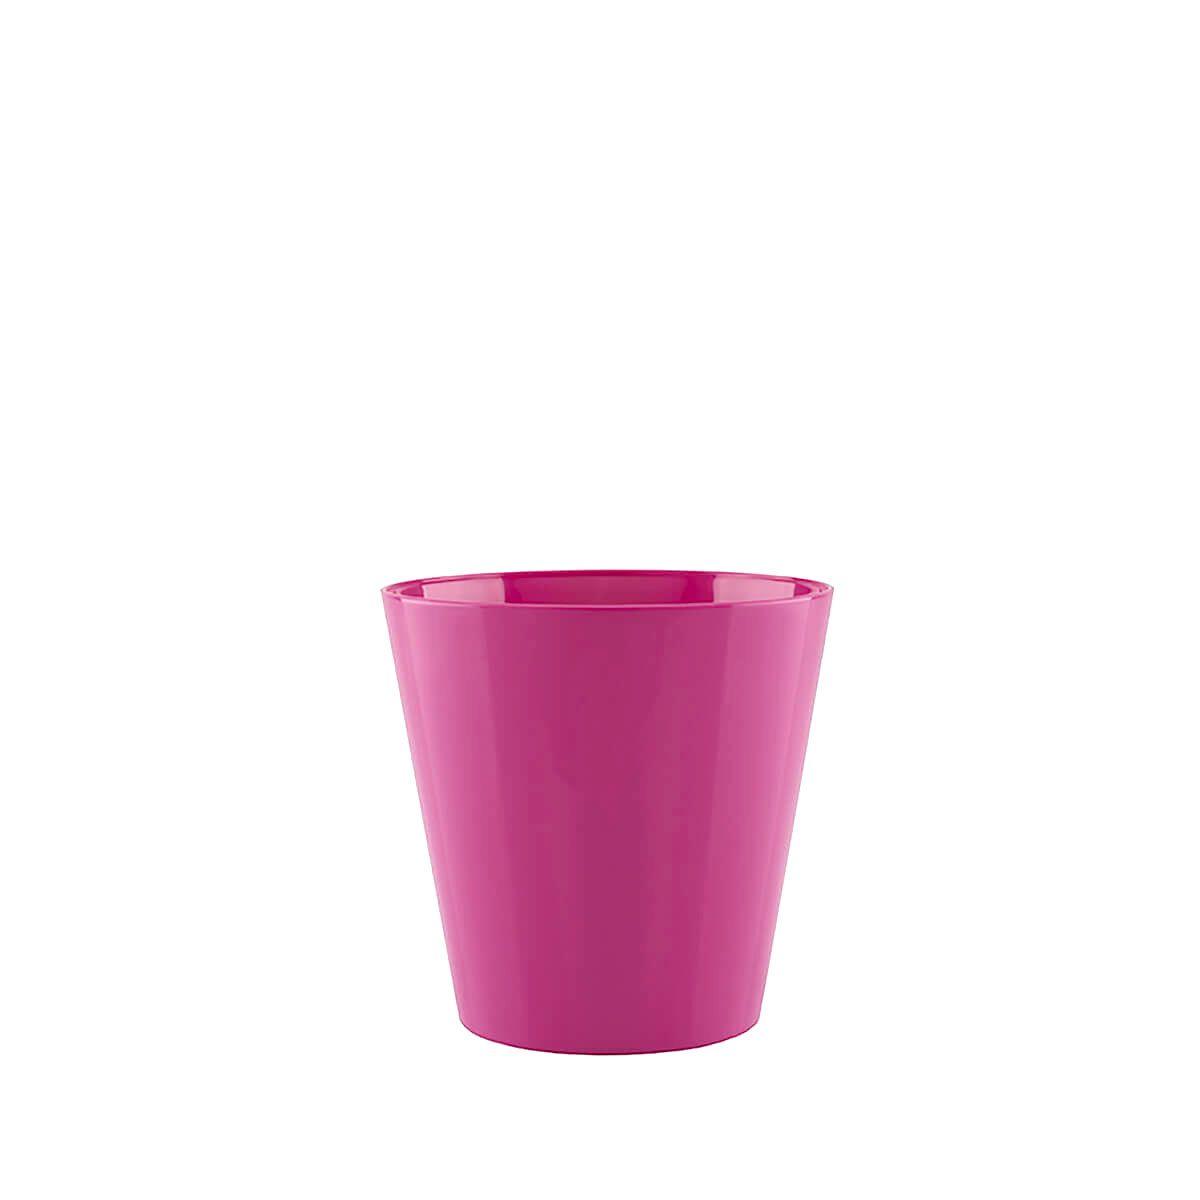 Vaso Porto Alto 13 x 15 cm Rosa Vasart